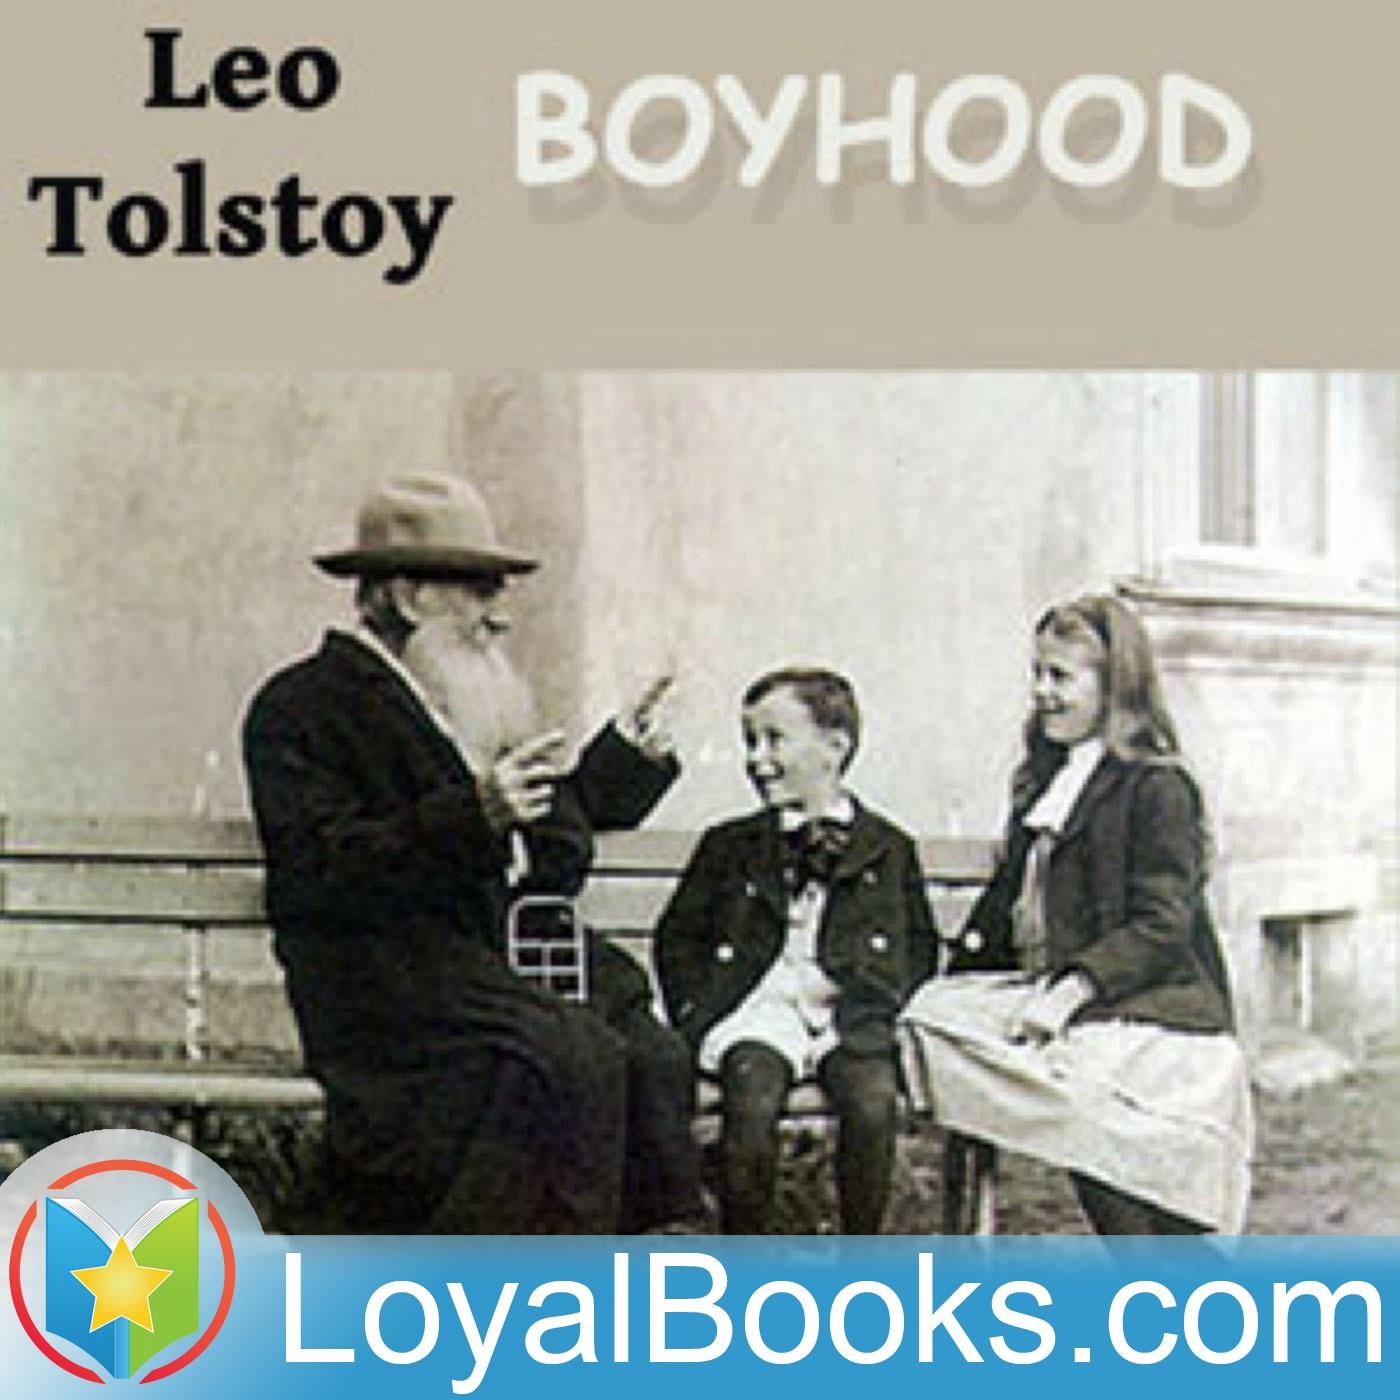 Boyhood by Leo Tolstoy  